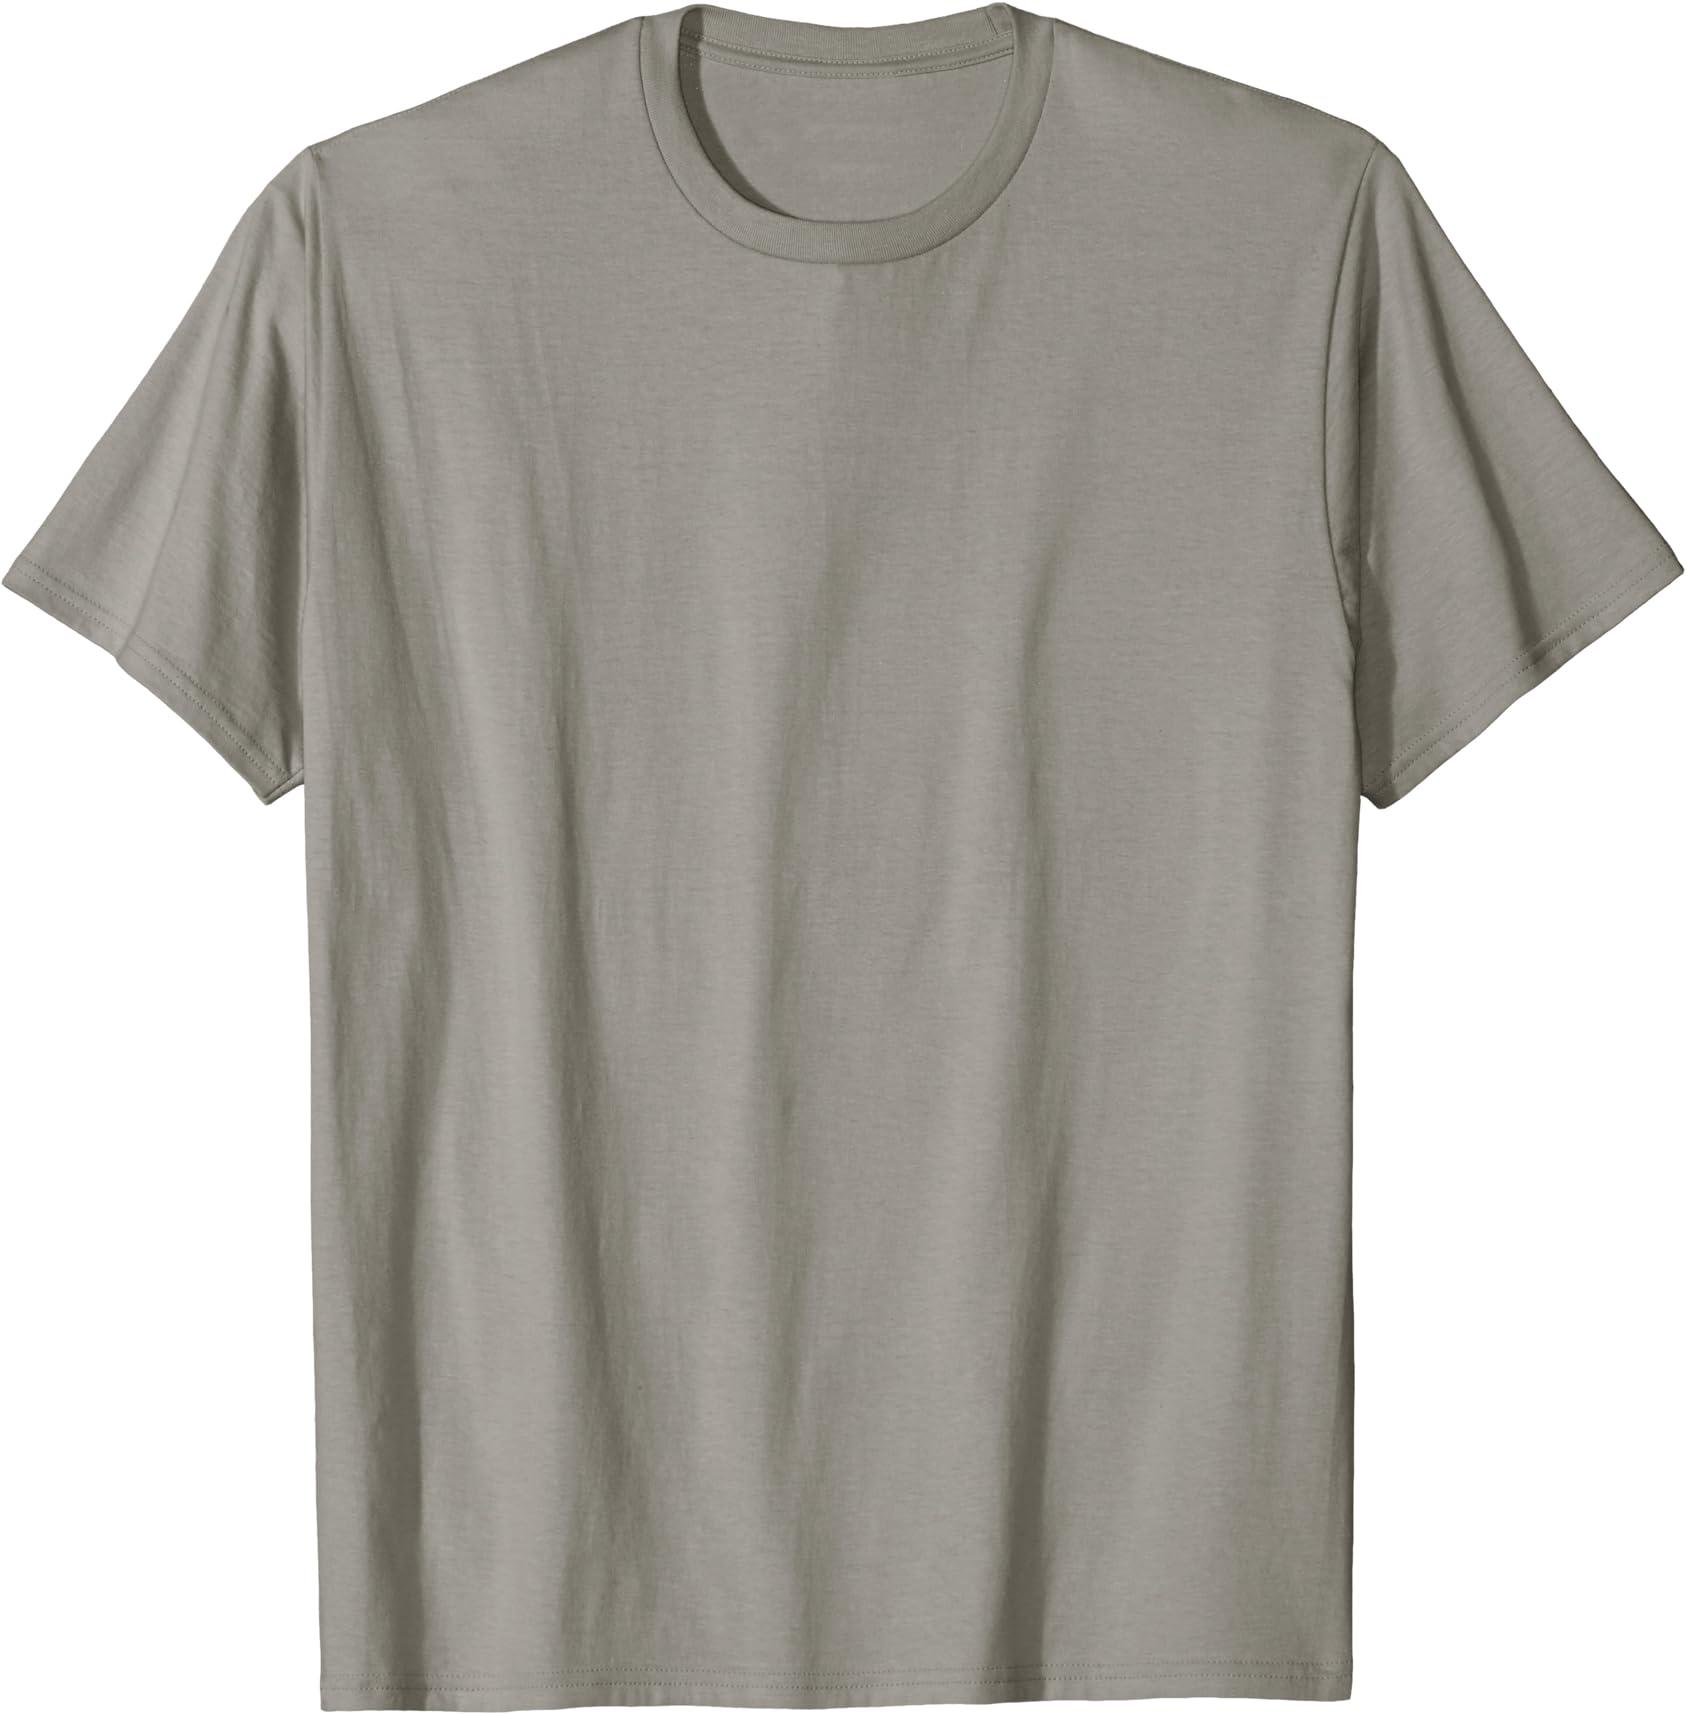 My Spirit Animal Unicorn Heather Grey Adult T-Shirt